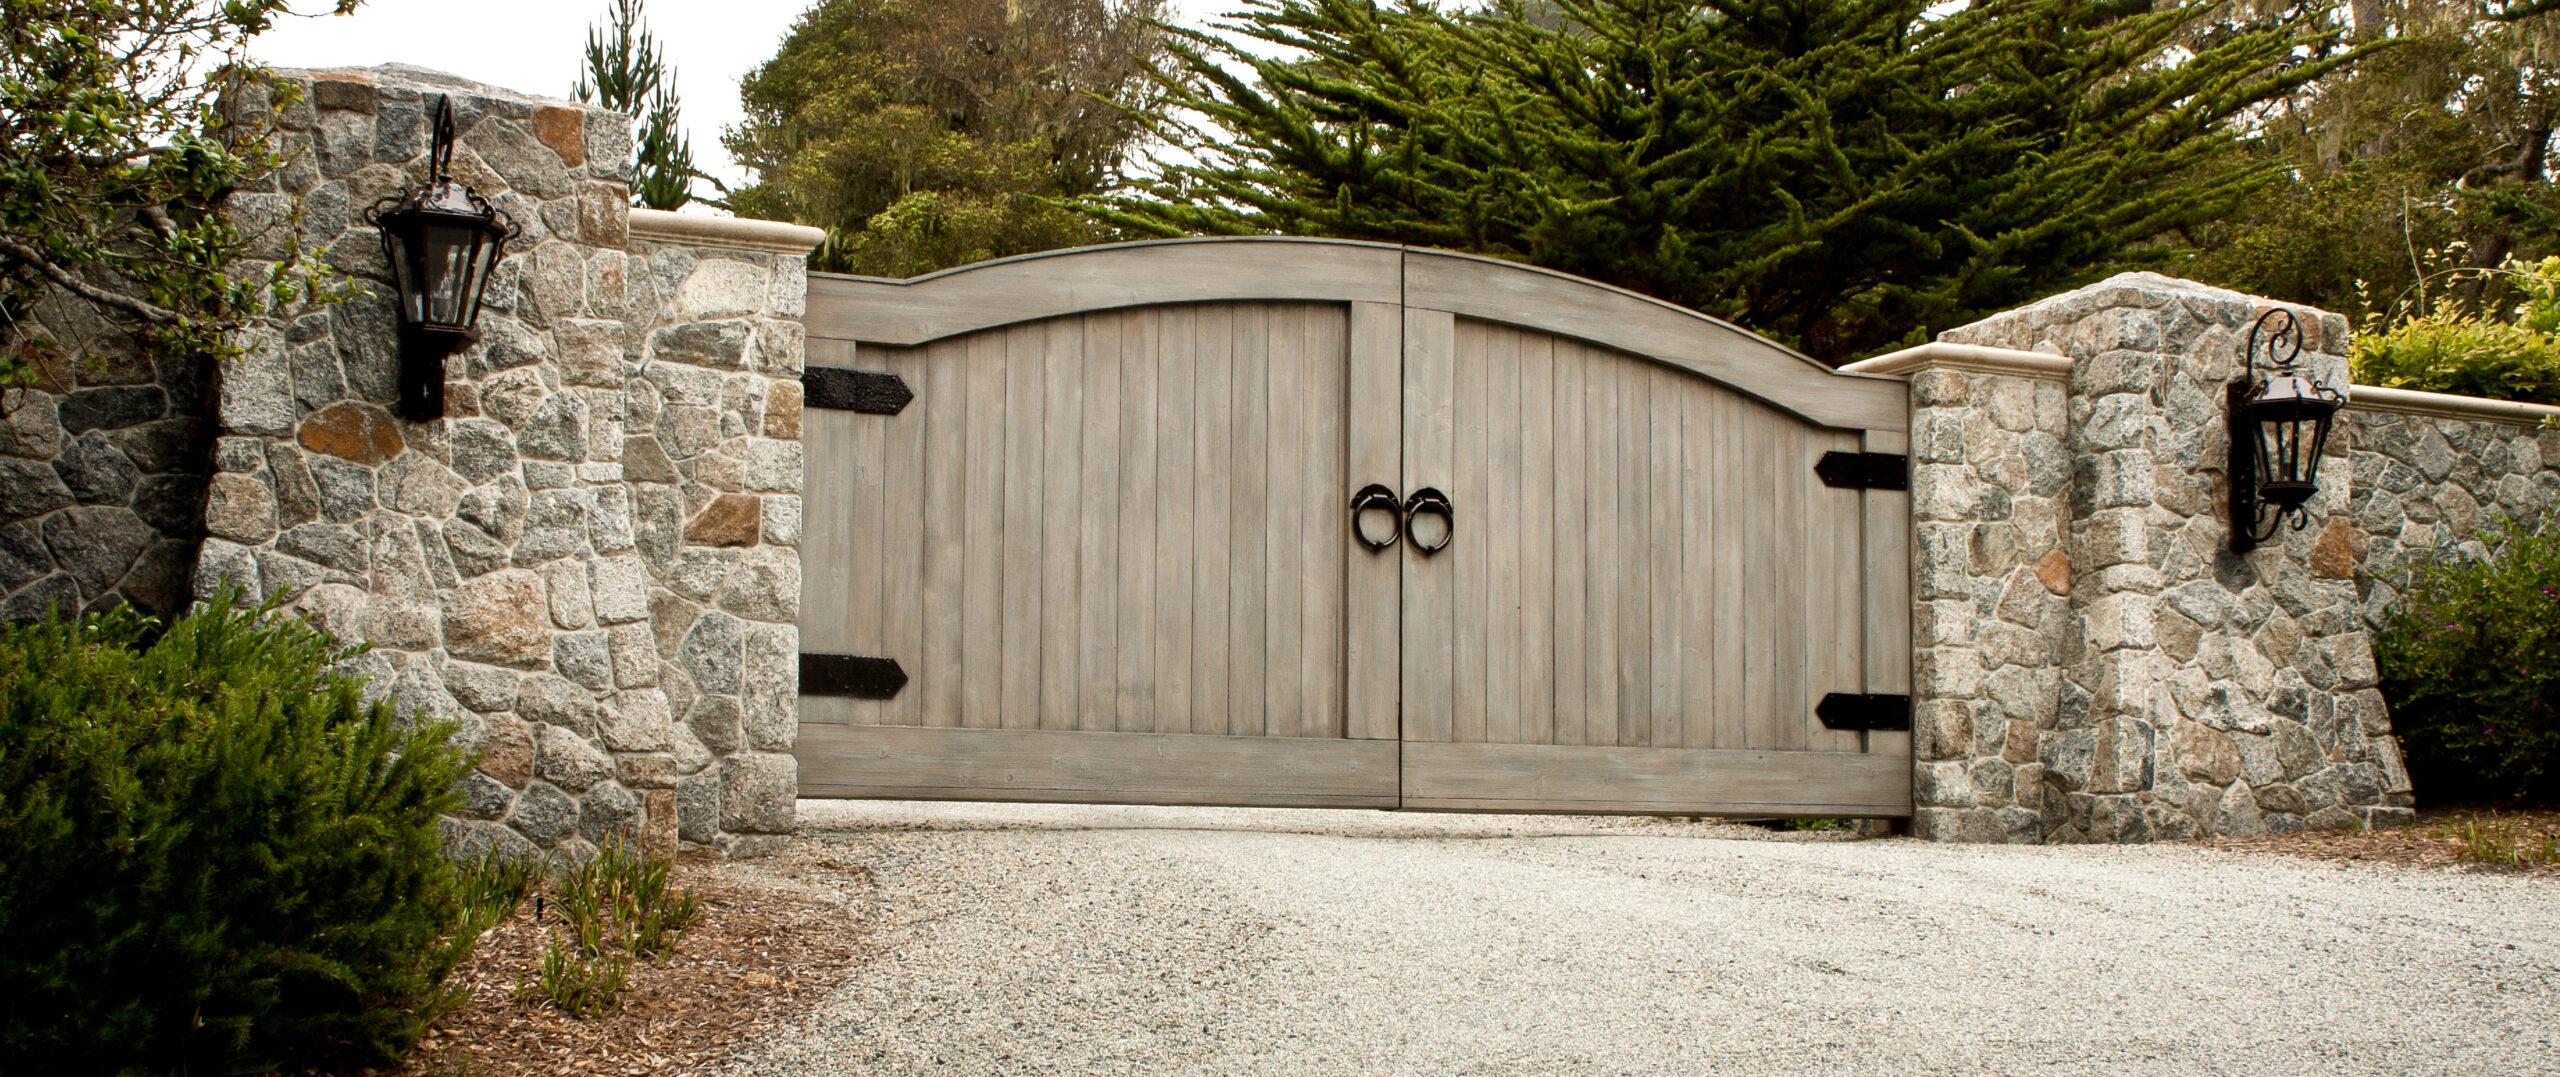 cream coloured gate